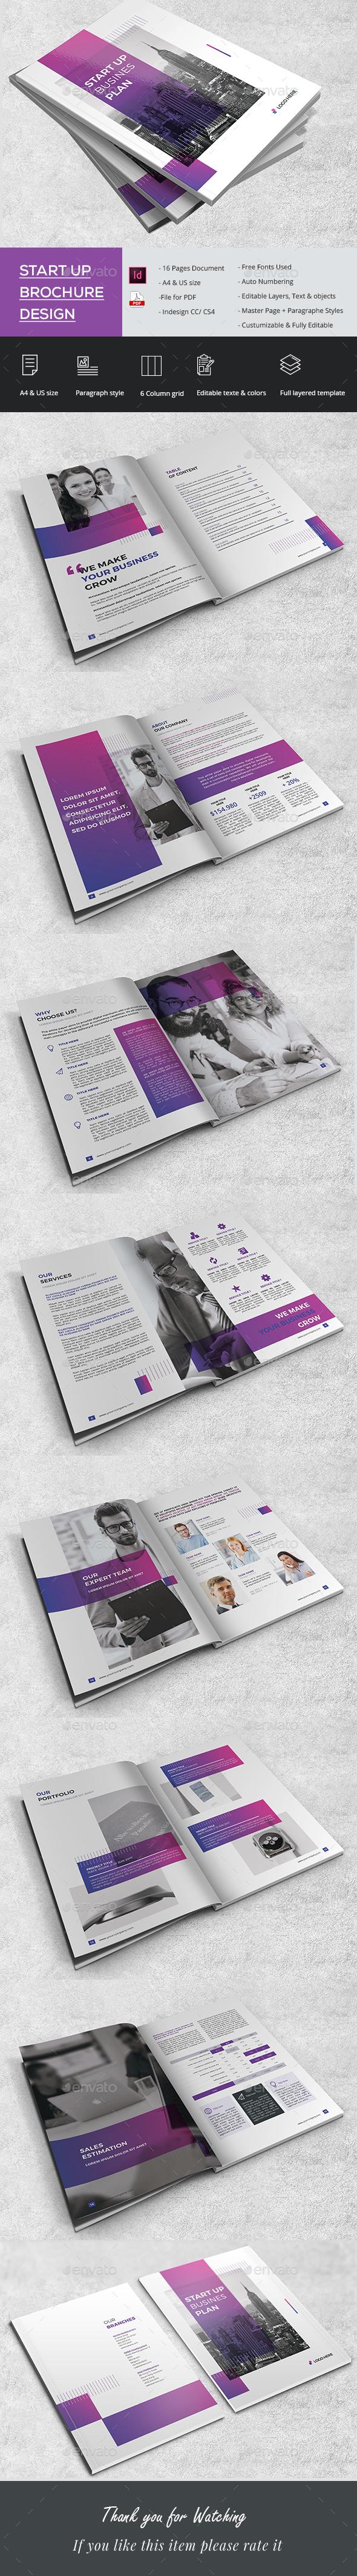 Stylish Start up Brochure - Brochures Print Templates